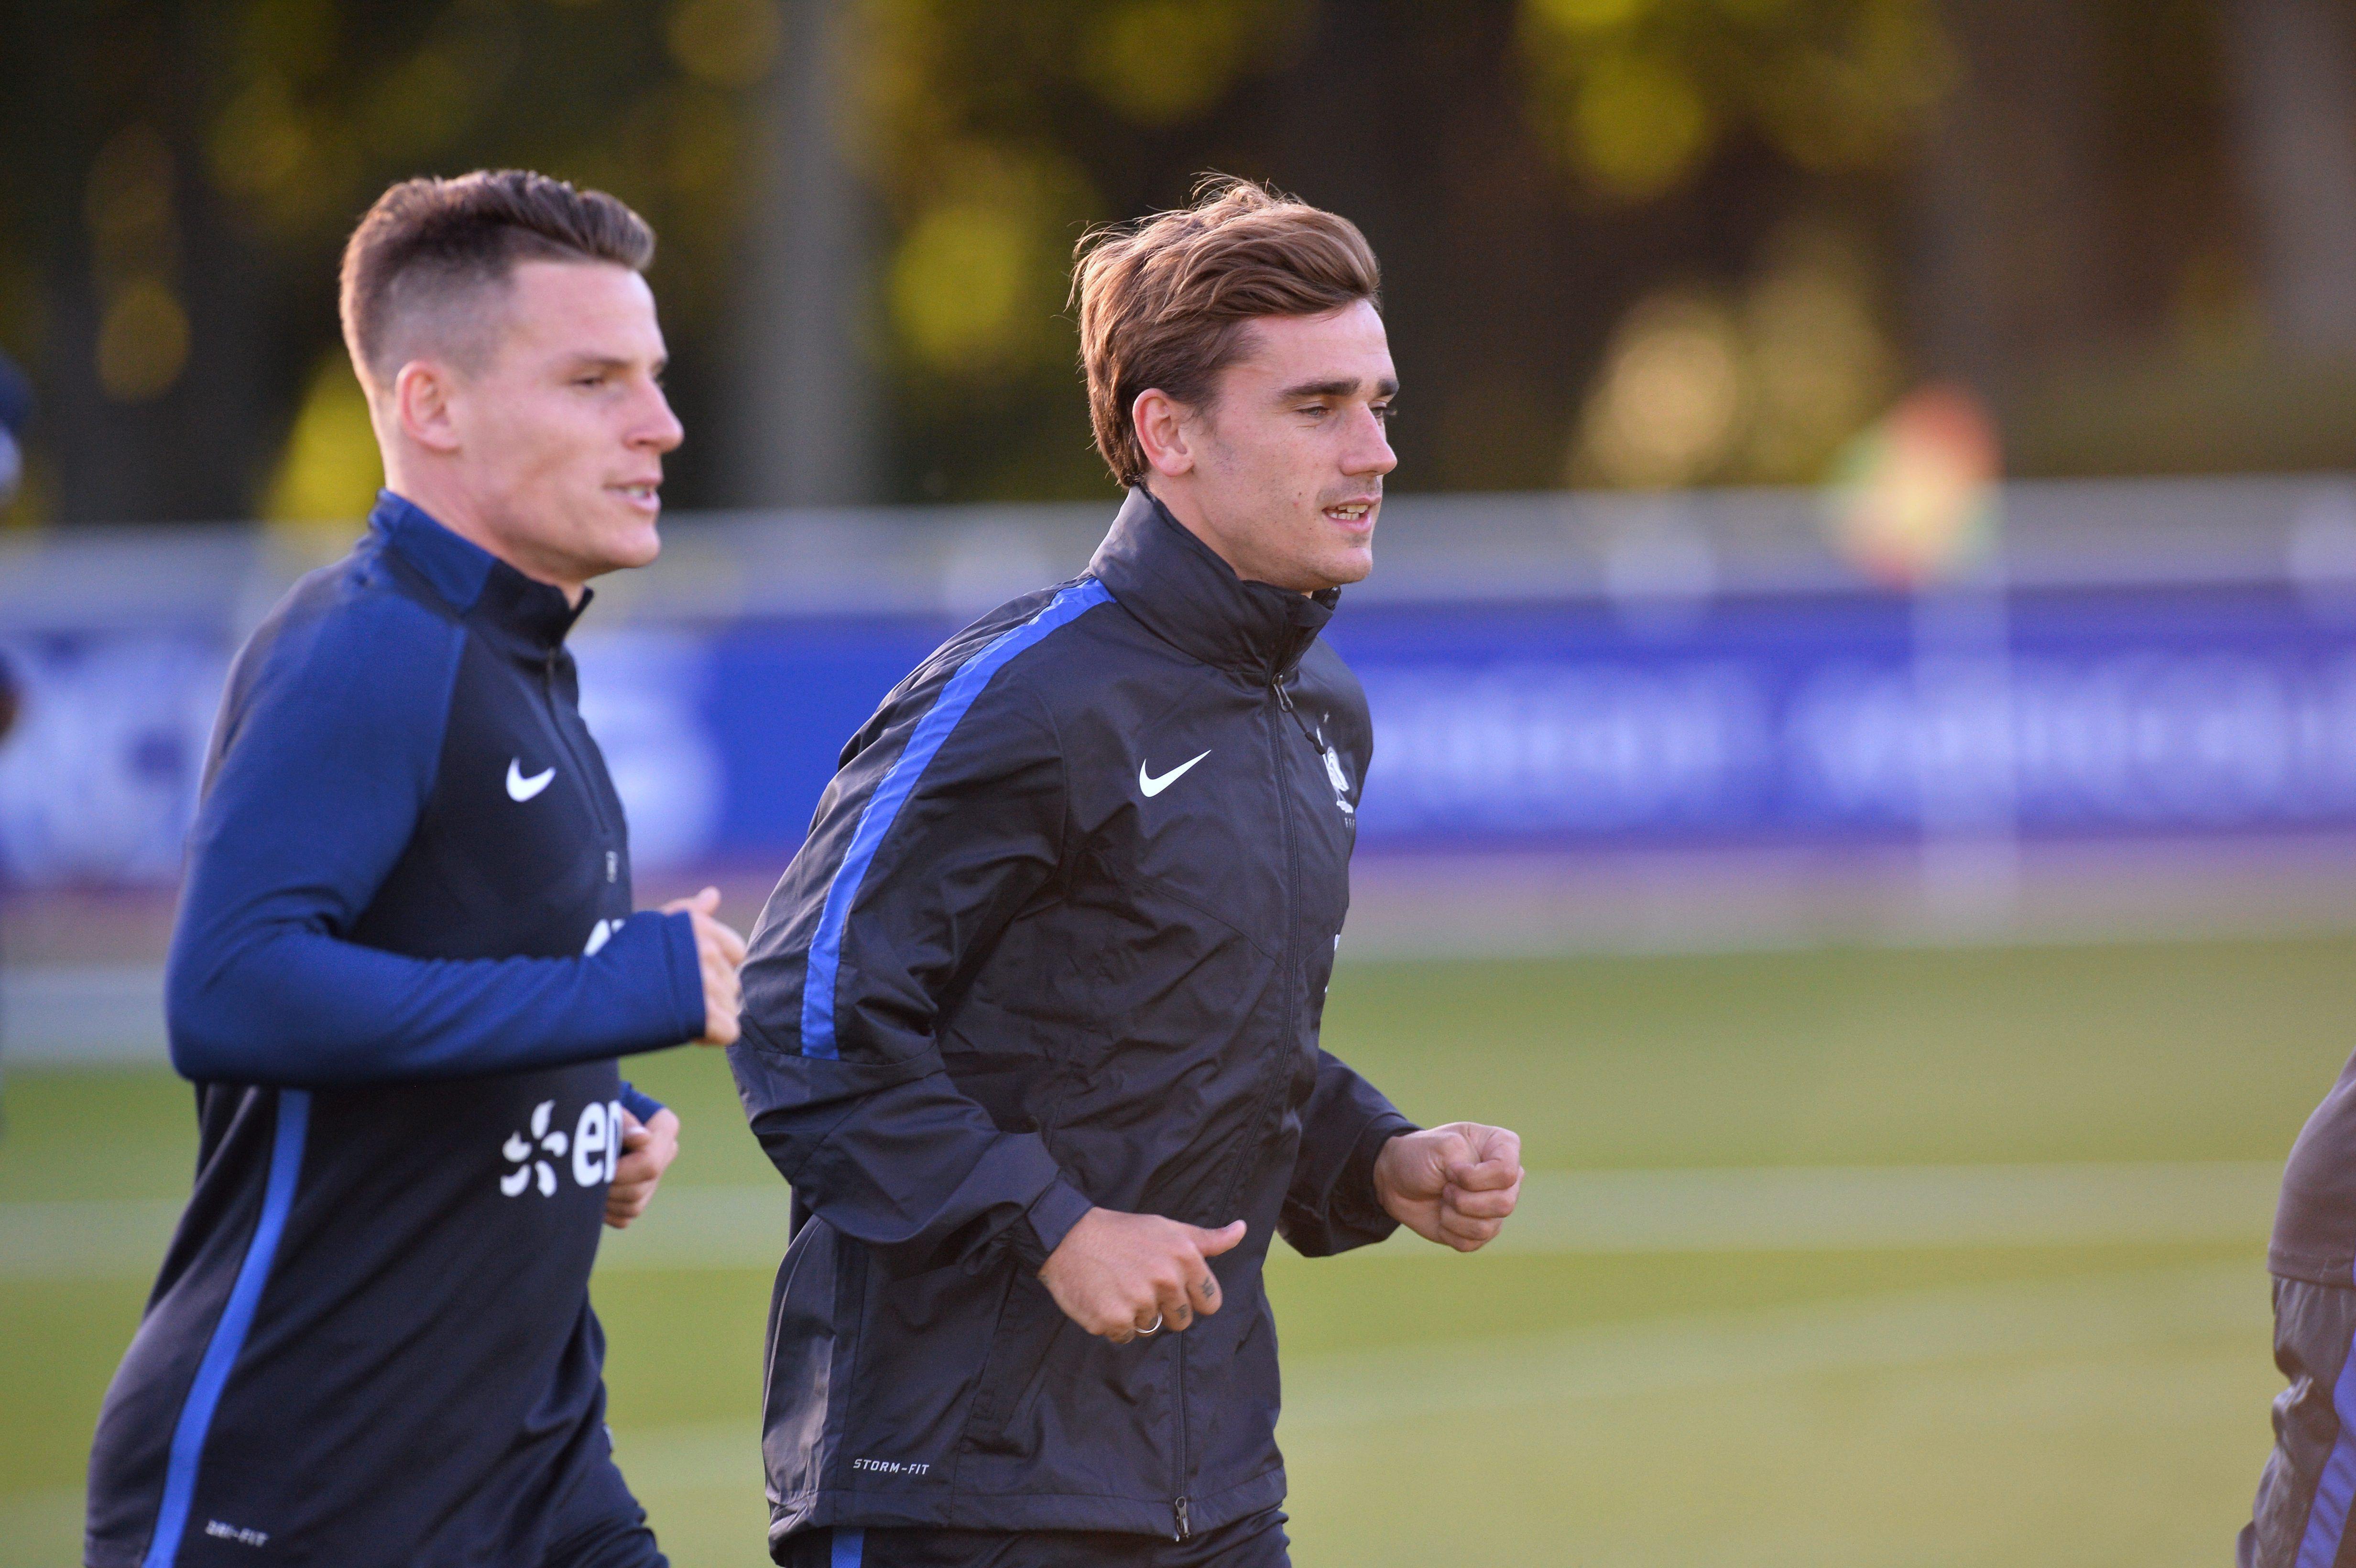 Football - Equipe de France - France-Bulgarie : vers un duo Griezmann-Gameiro devant